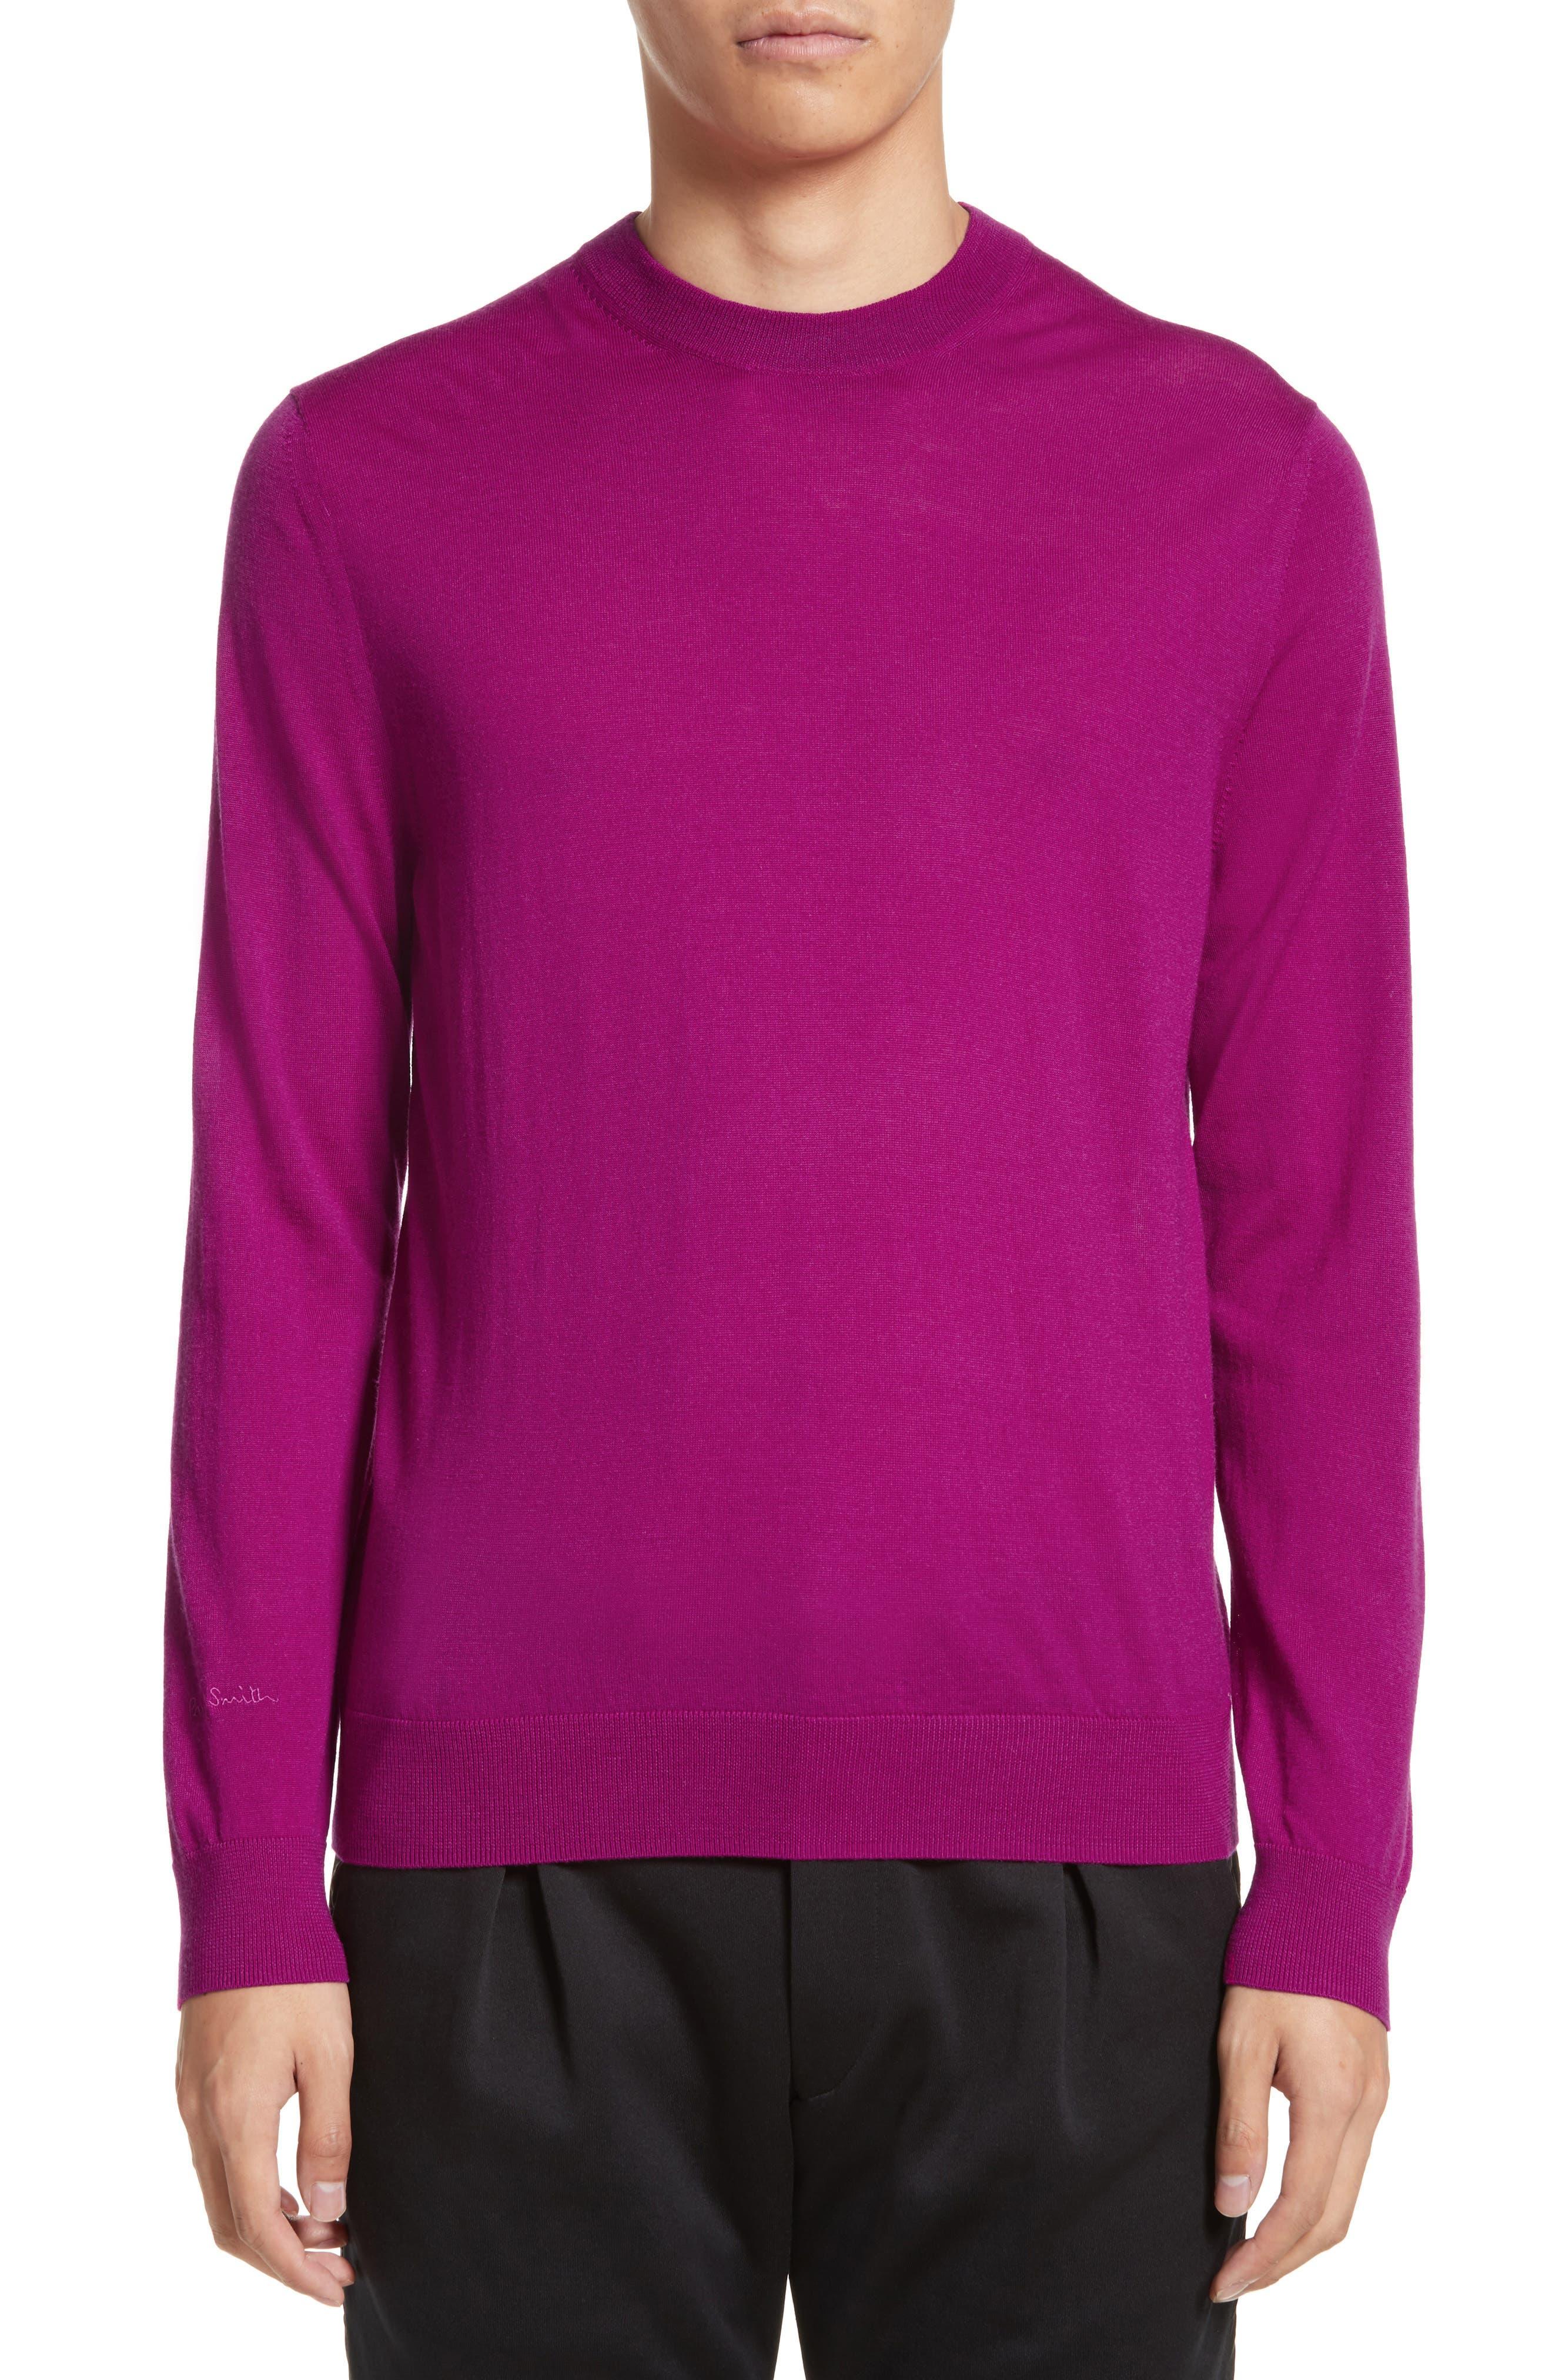 Main Image - Paul Smith Merino Wool Crewneck Sweater